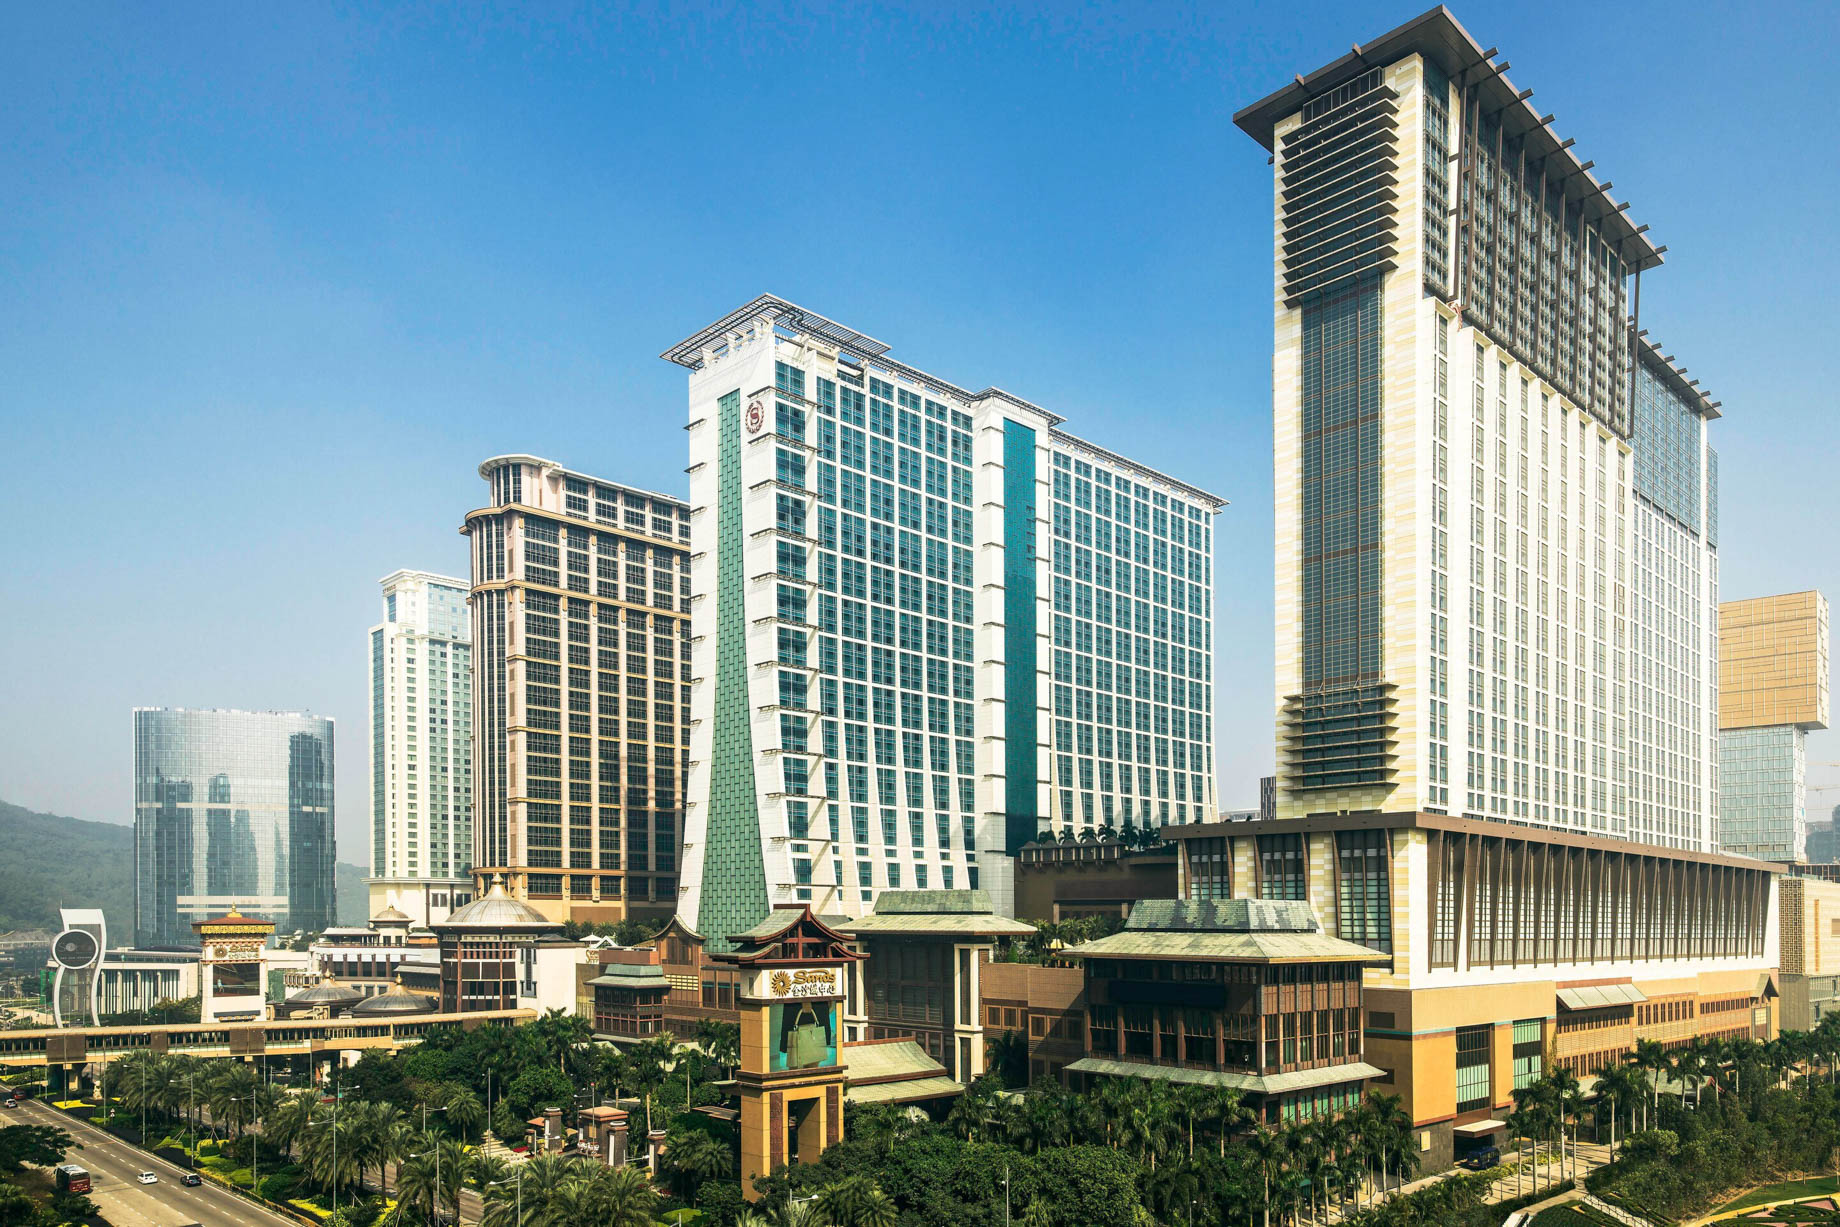 The St. Regis Macao Luxury Hotel - Cotai, Macau SAR, China - Hotel Exterior View